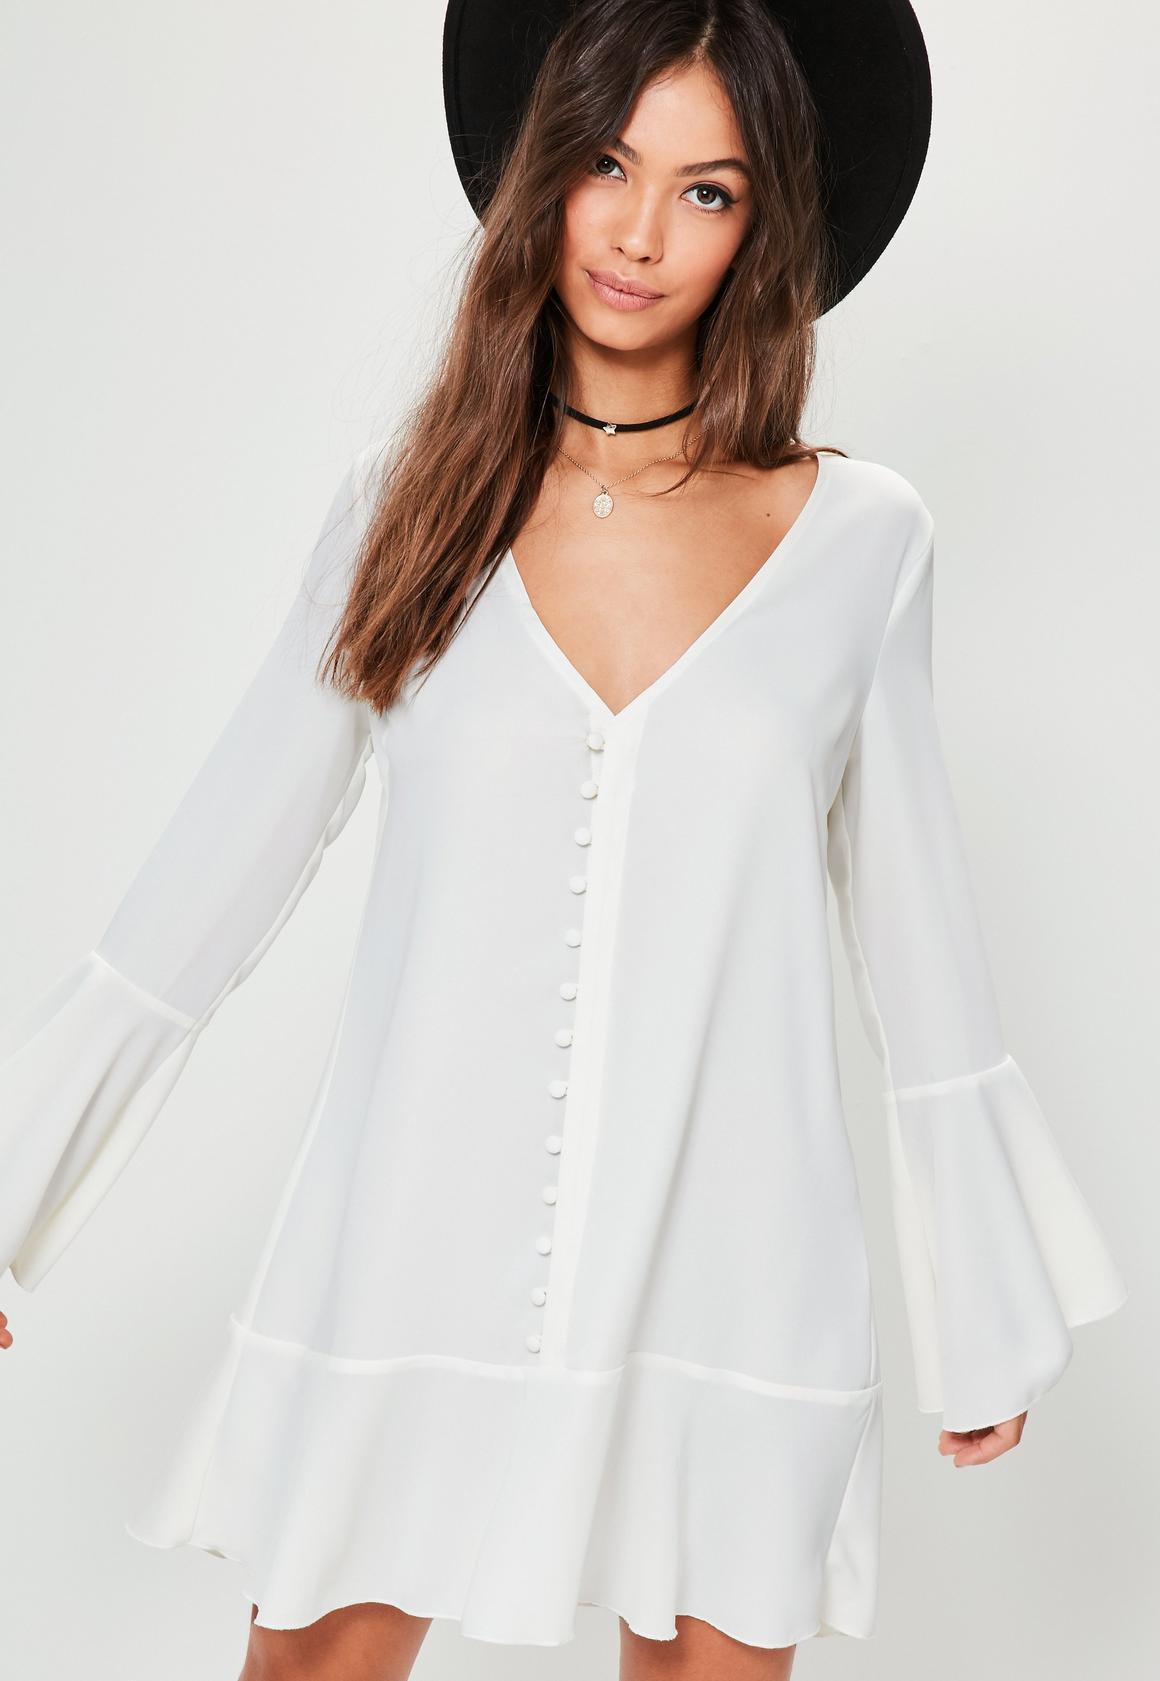 Shirt Dresses | Long & Short Sleeve Shirt Dresses - Missguided